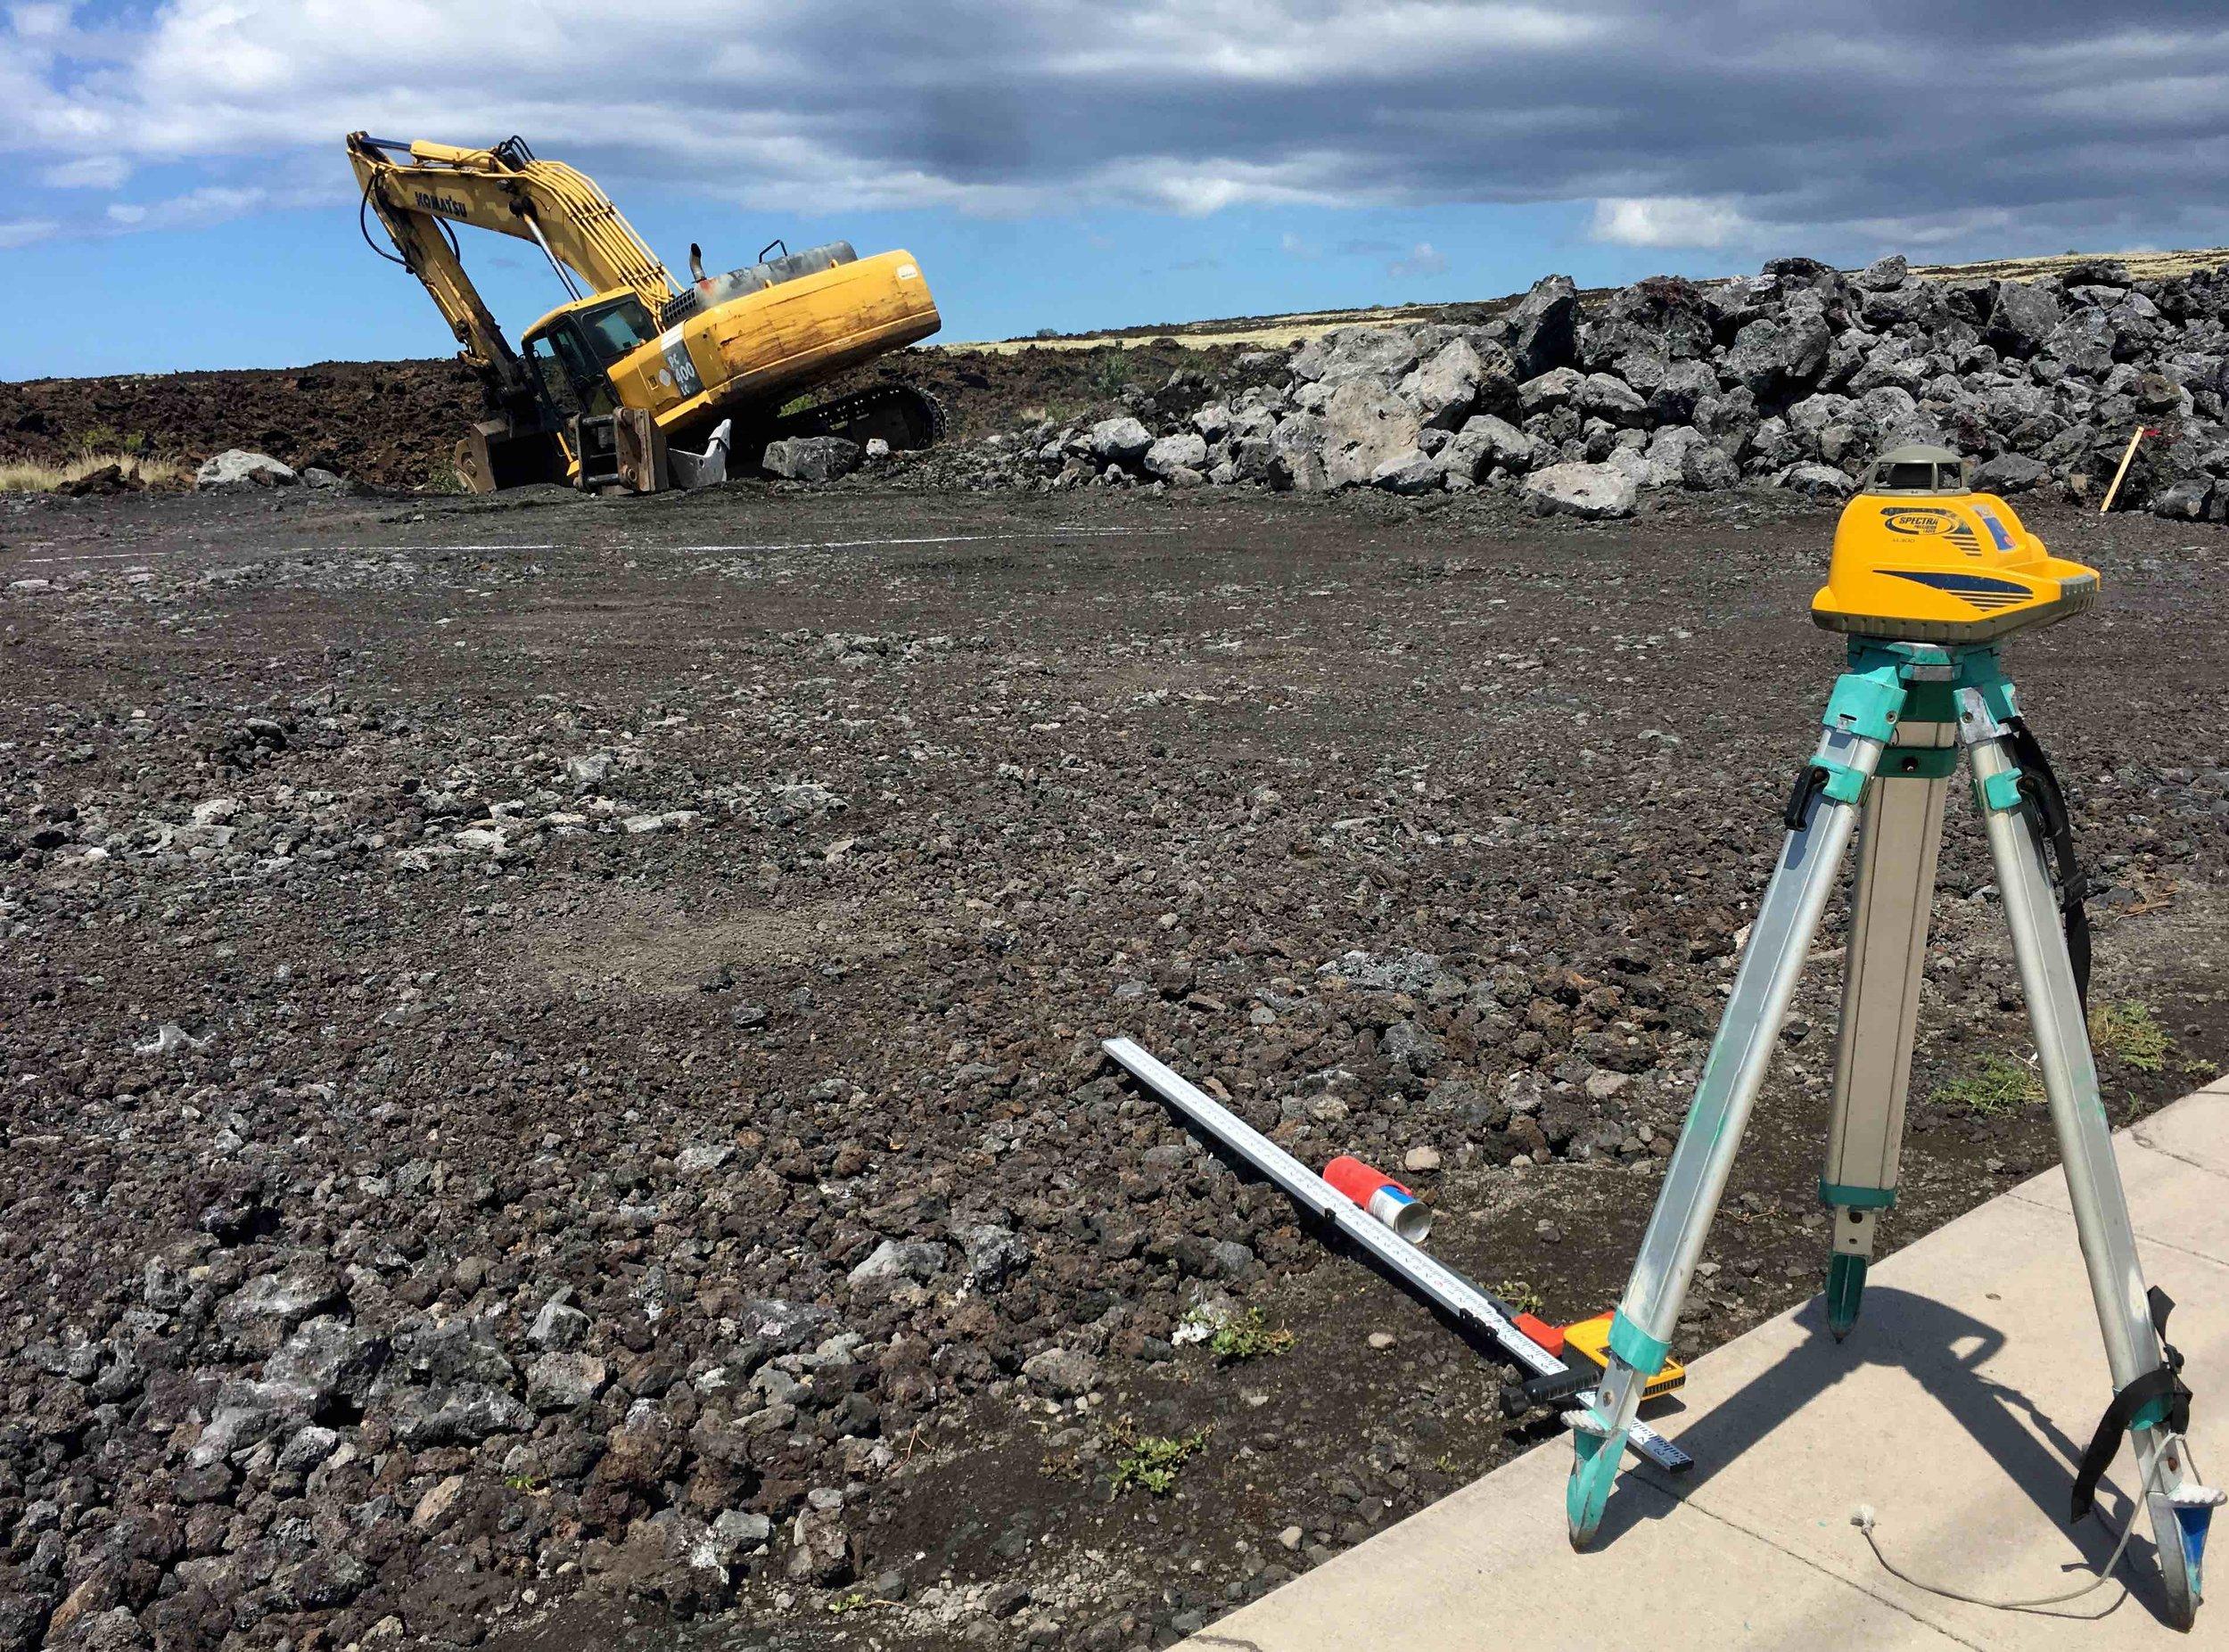 Surveying services Kona Hawaii